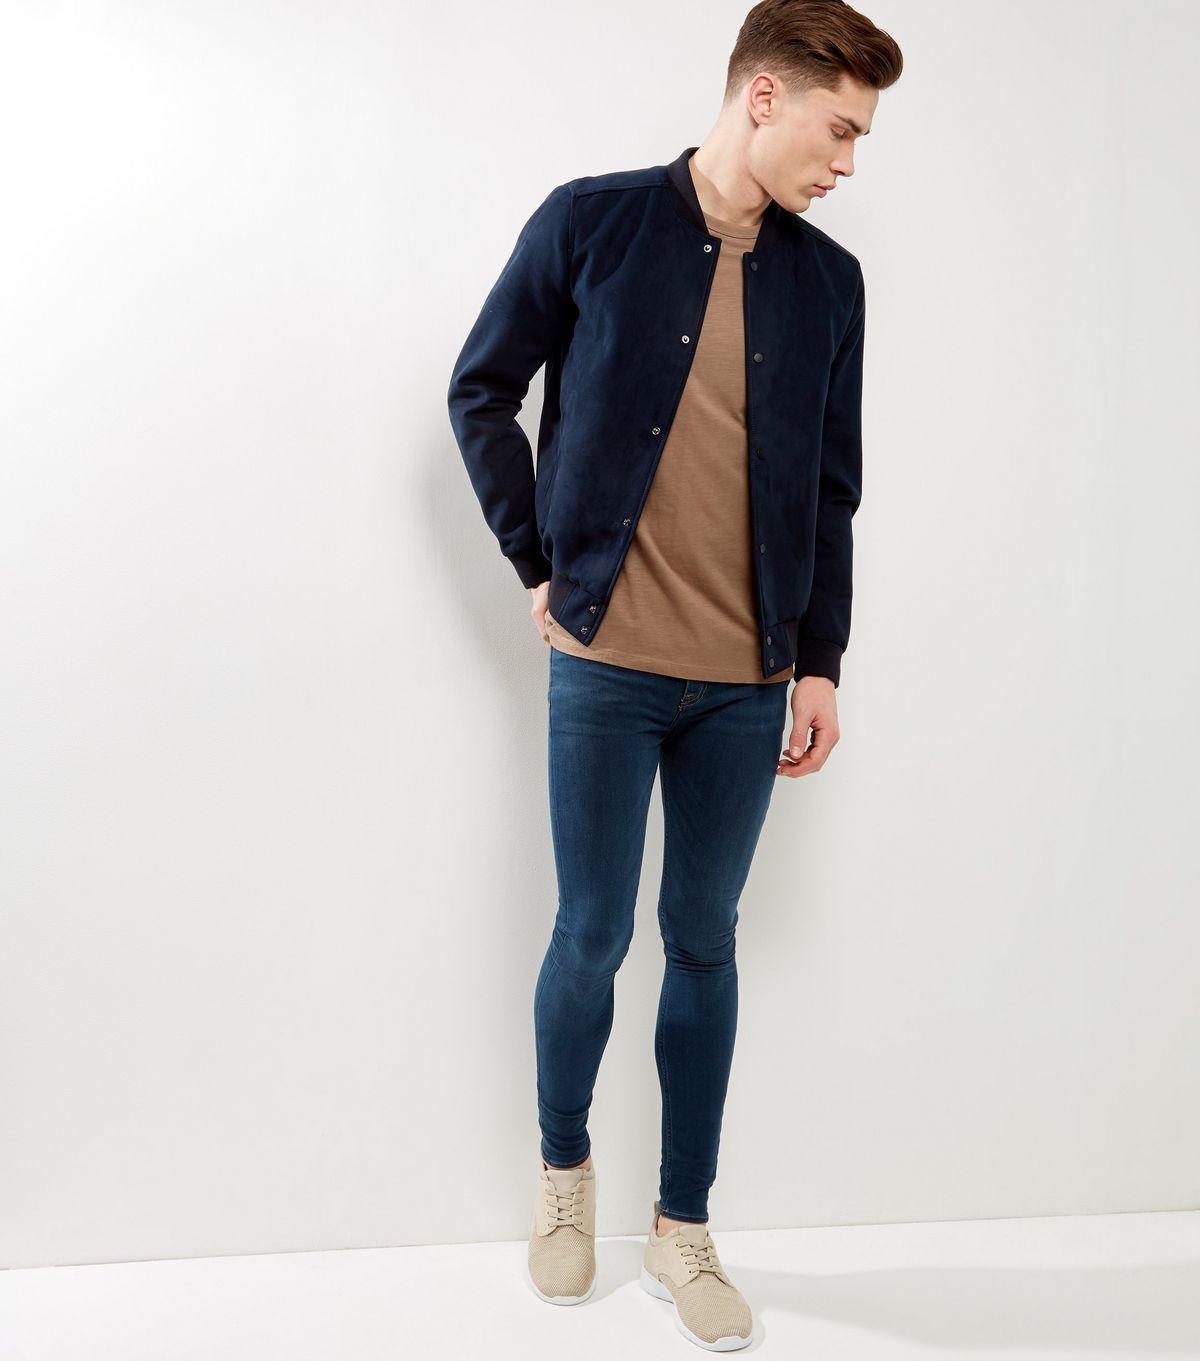 pin von skinnyjeansfetish auf skinny jeans kireit pillifarkkuja pinterest jeans skinny. Black Bedroom Furniture Sets. Home Design Ideas